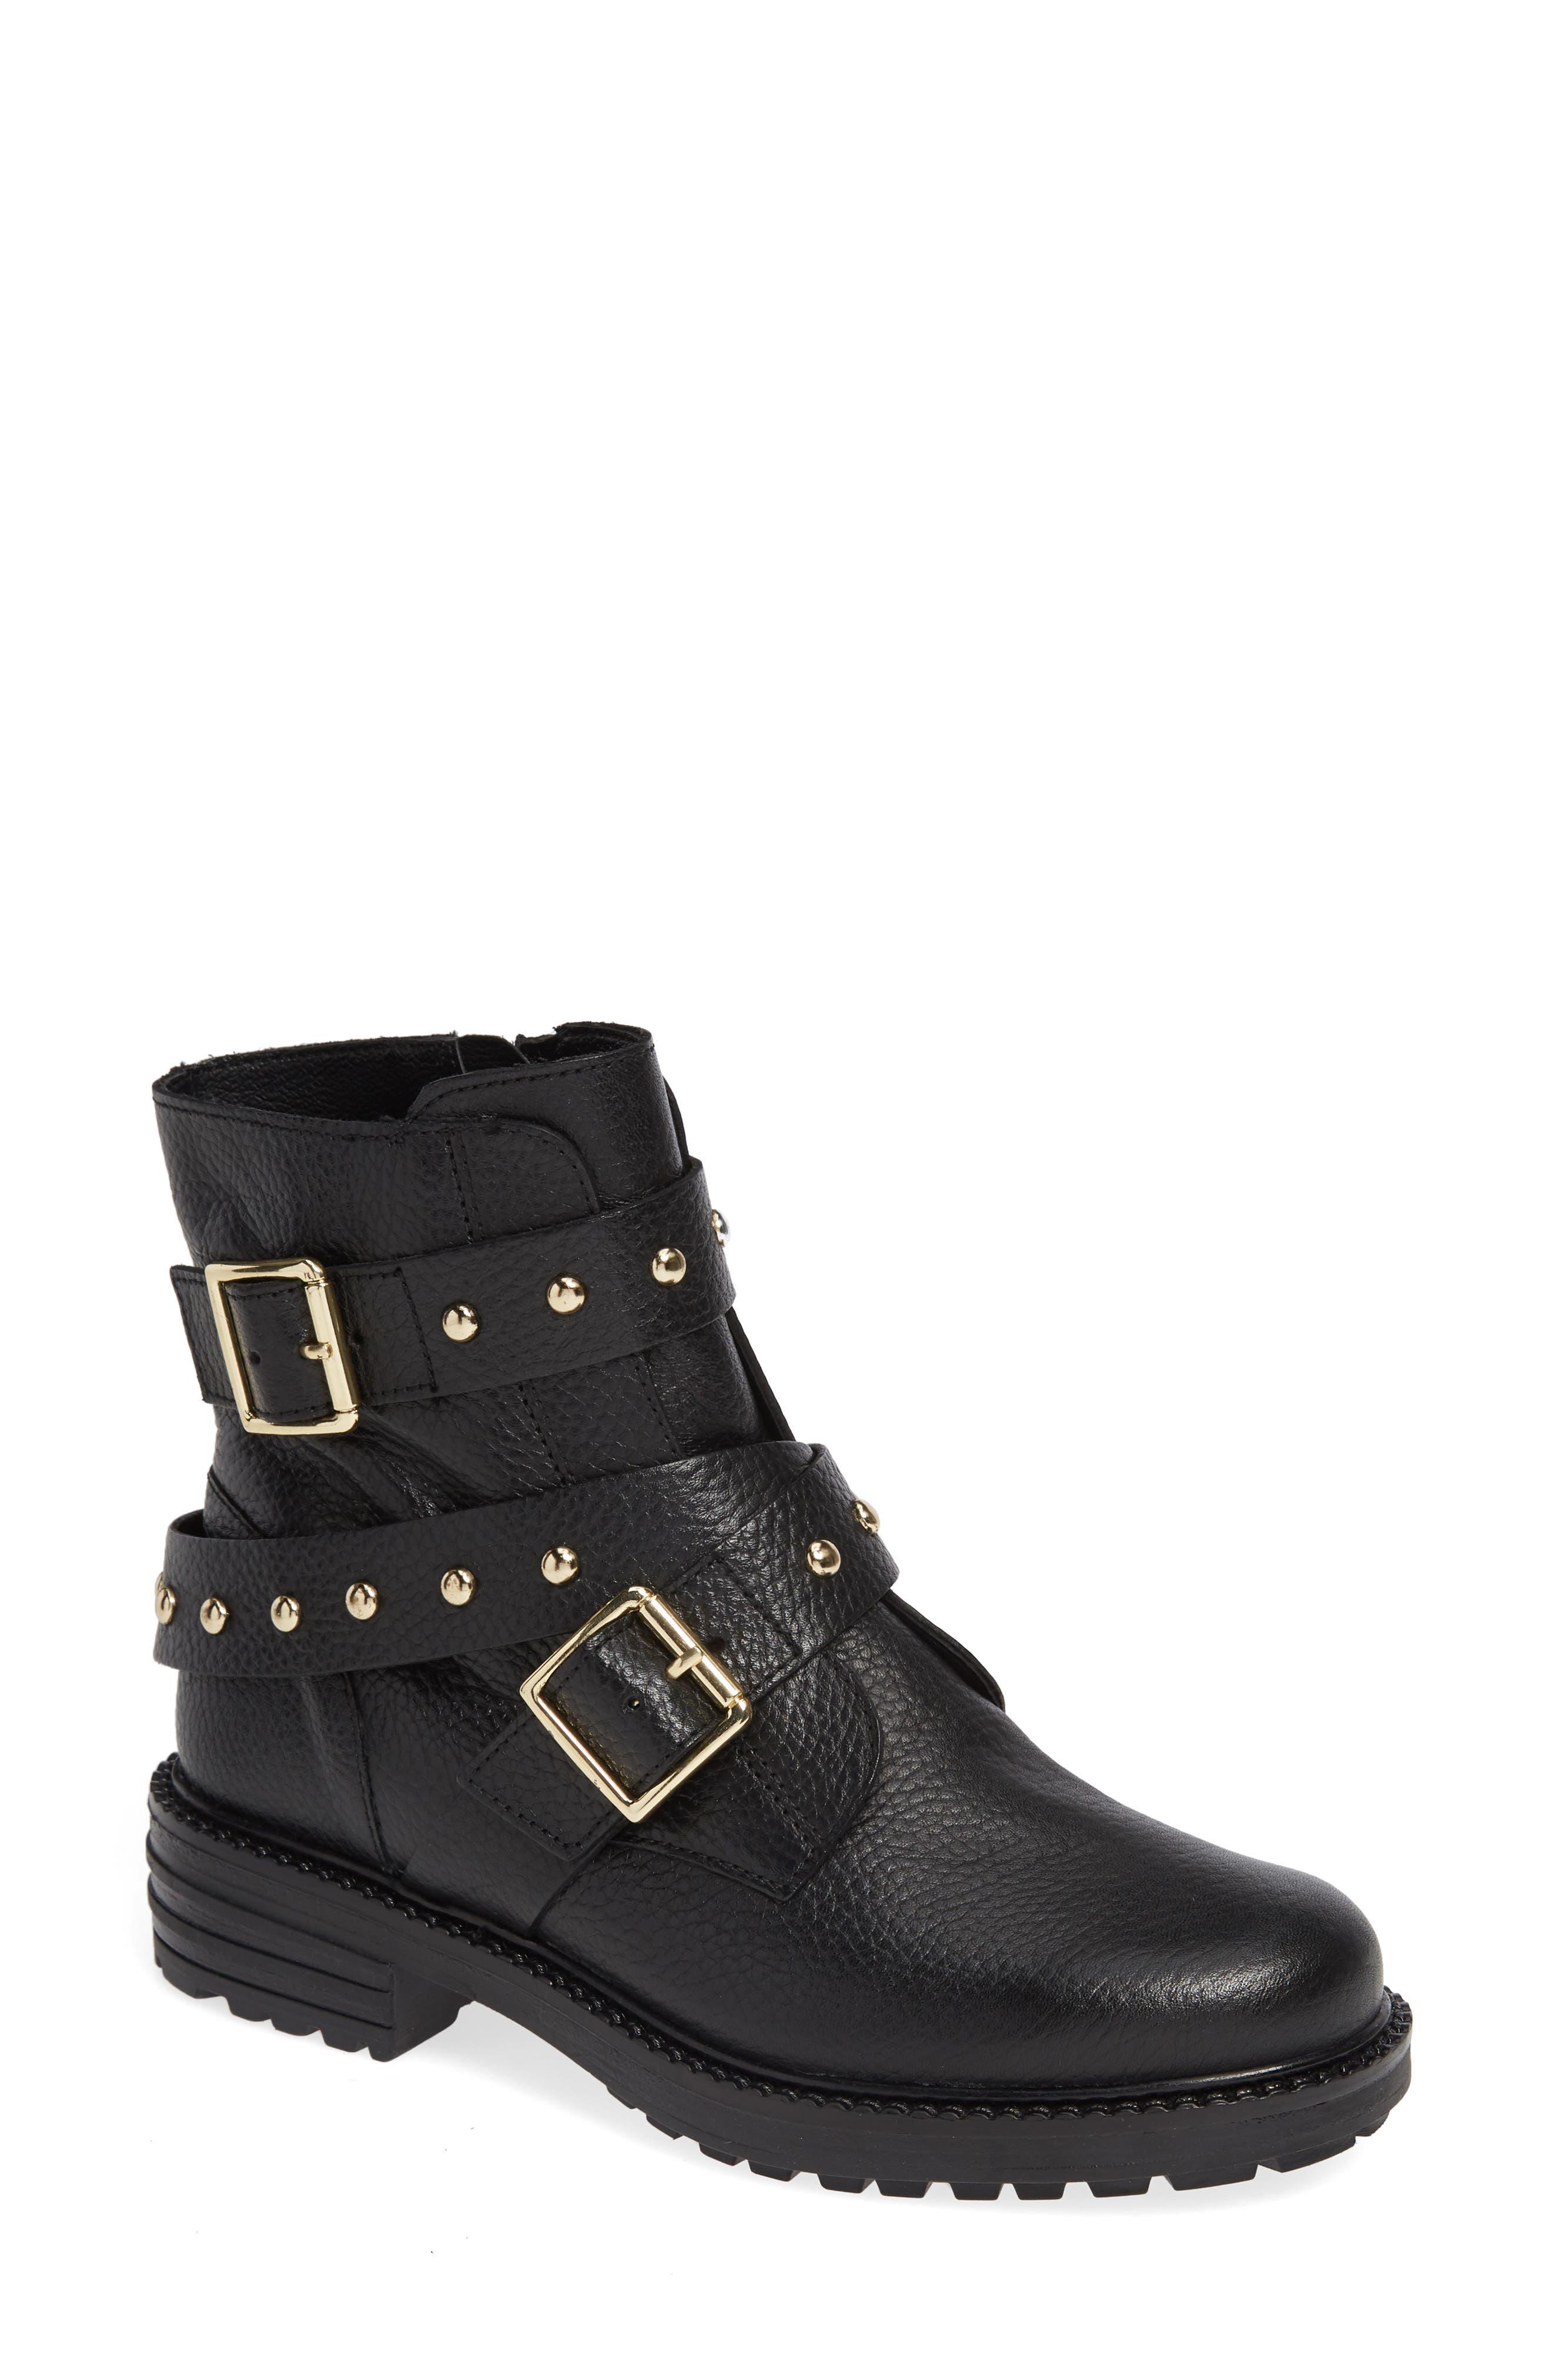 KURT GEIGER Women'S Stinger Moto Boots in Black